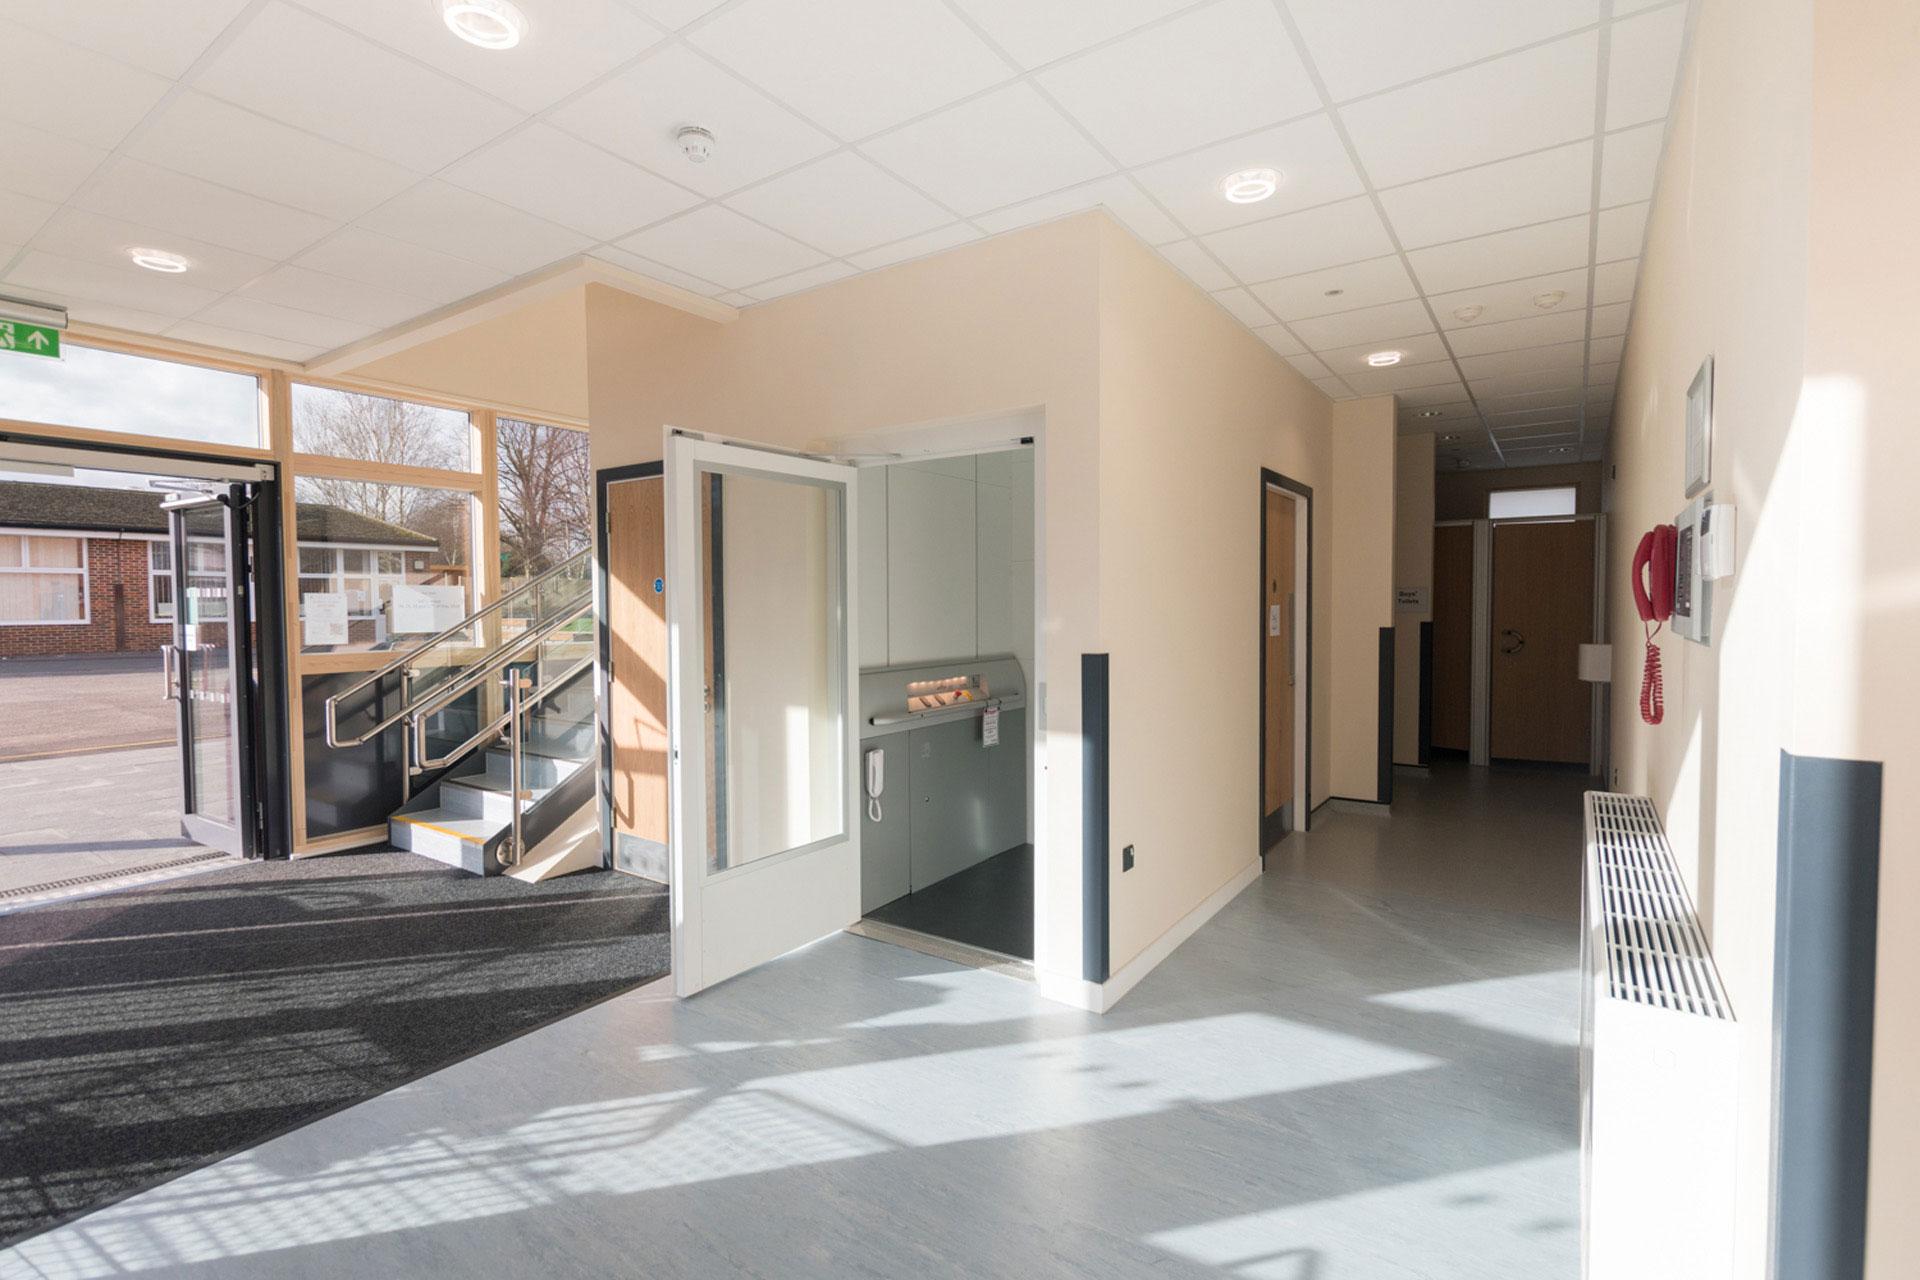 Woodcote Primary school - Modular School expansion - Internal entrance and DDA compliant lift